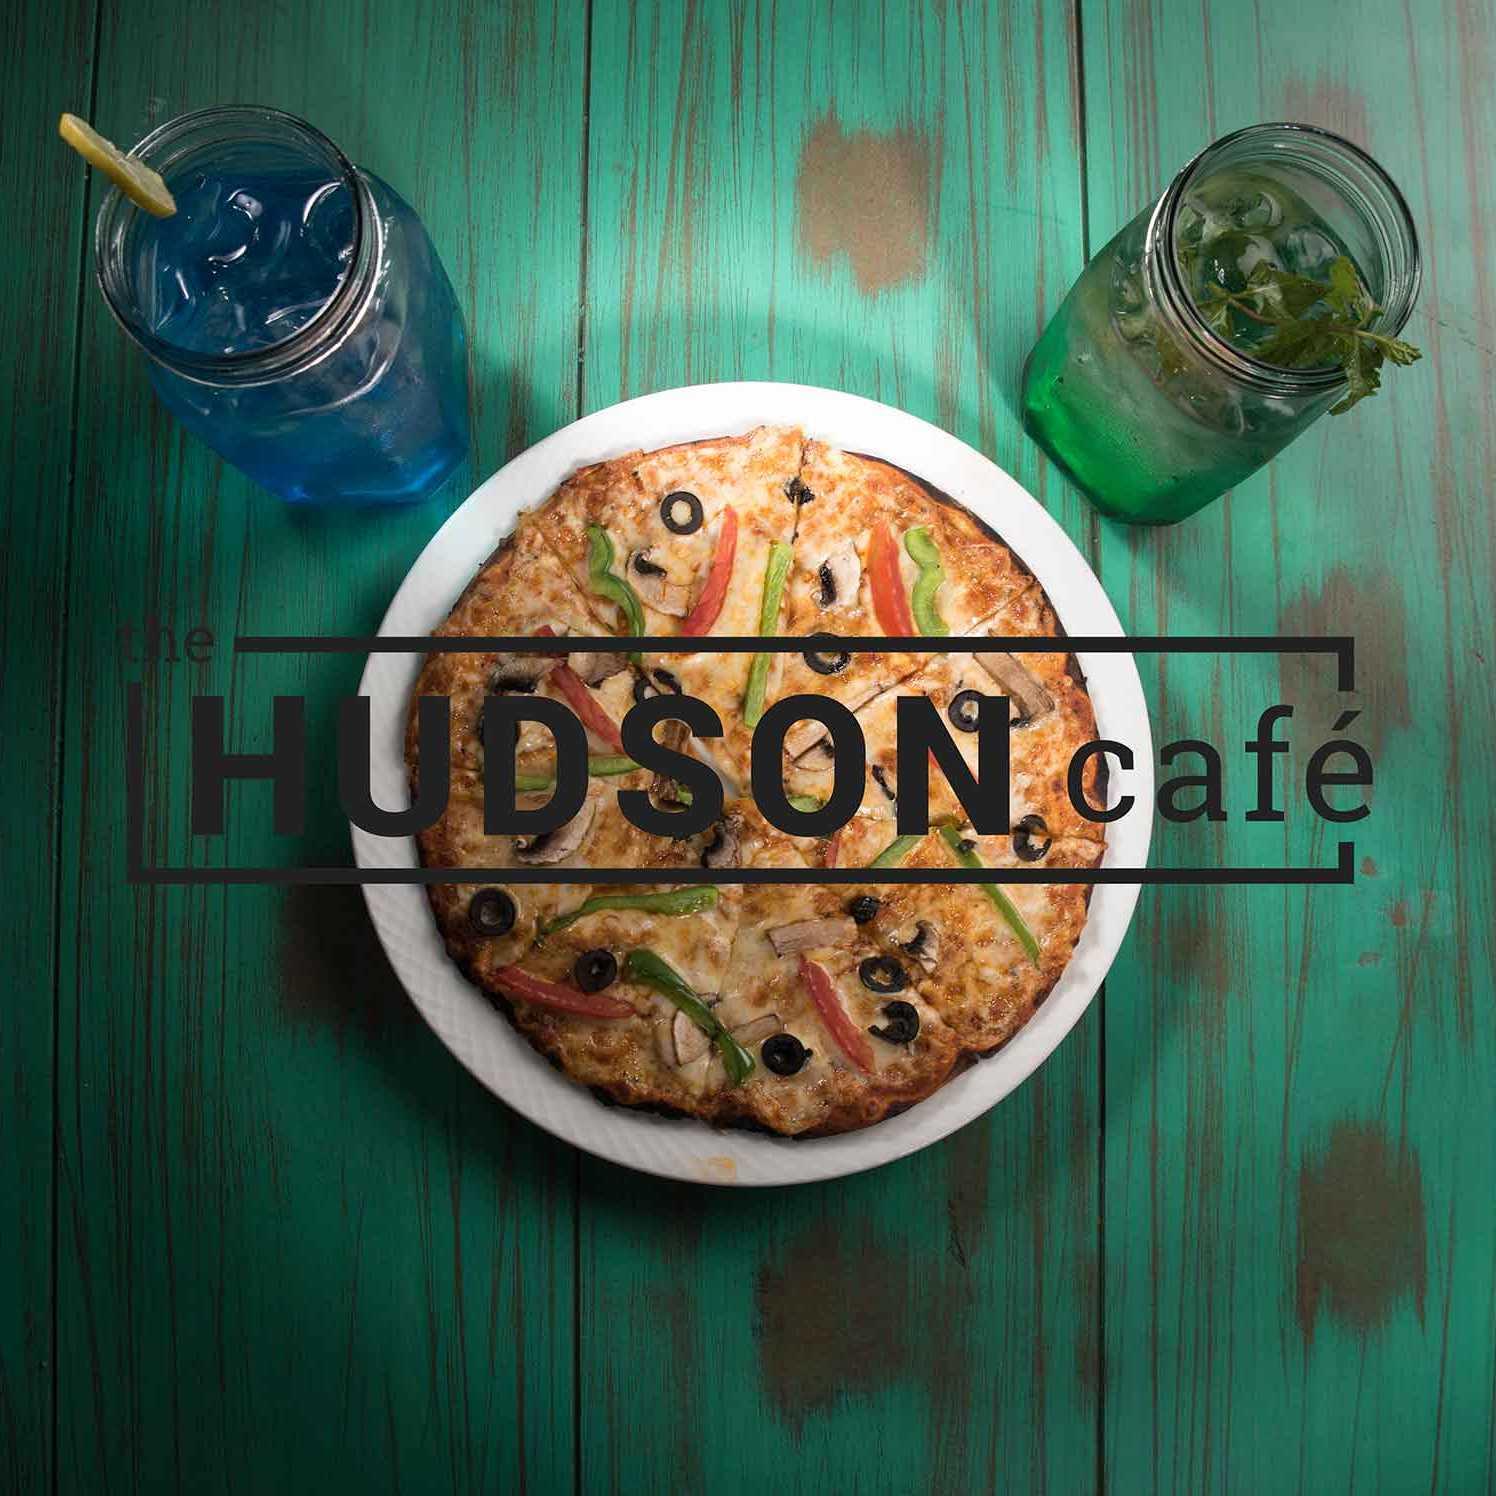 Hudson Cafe text